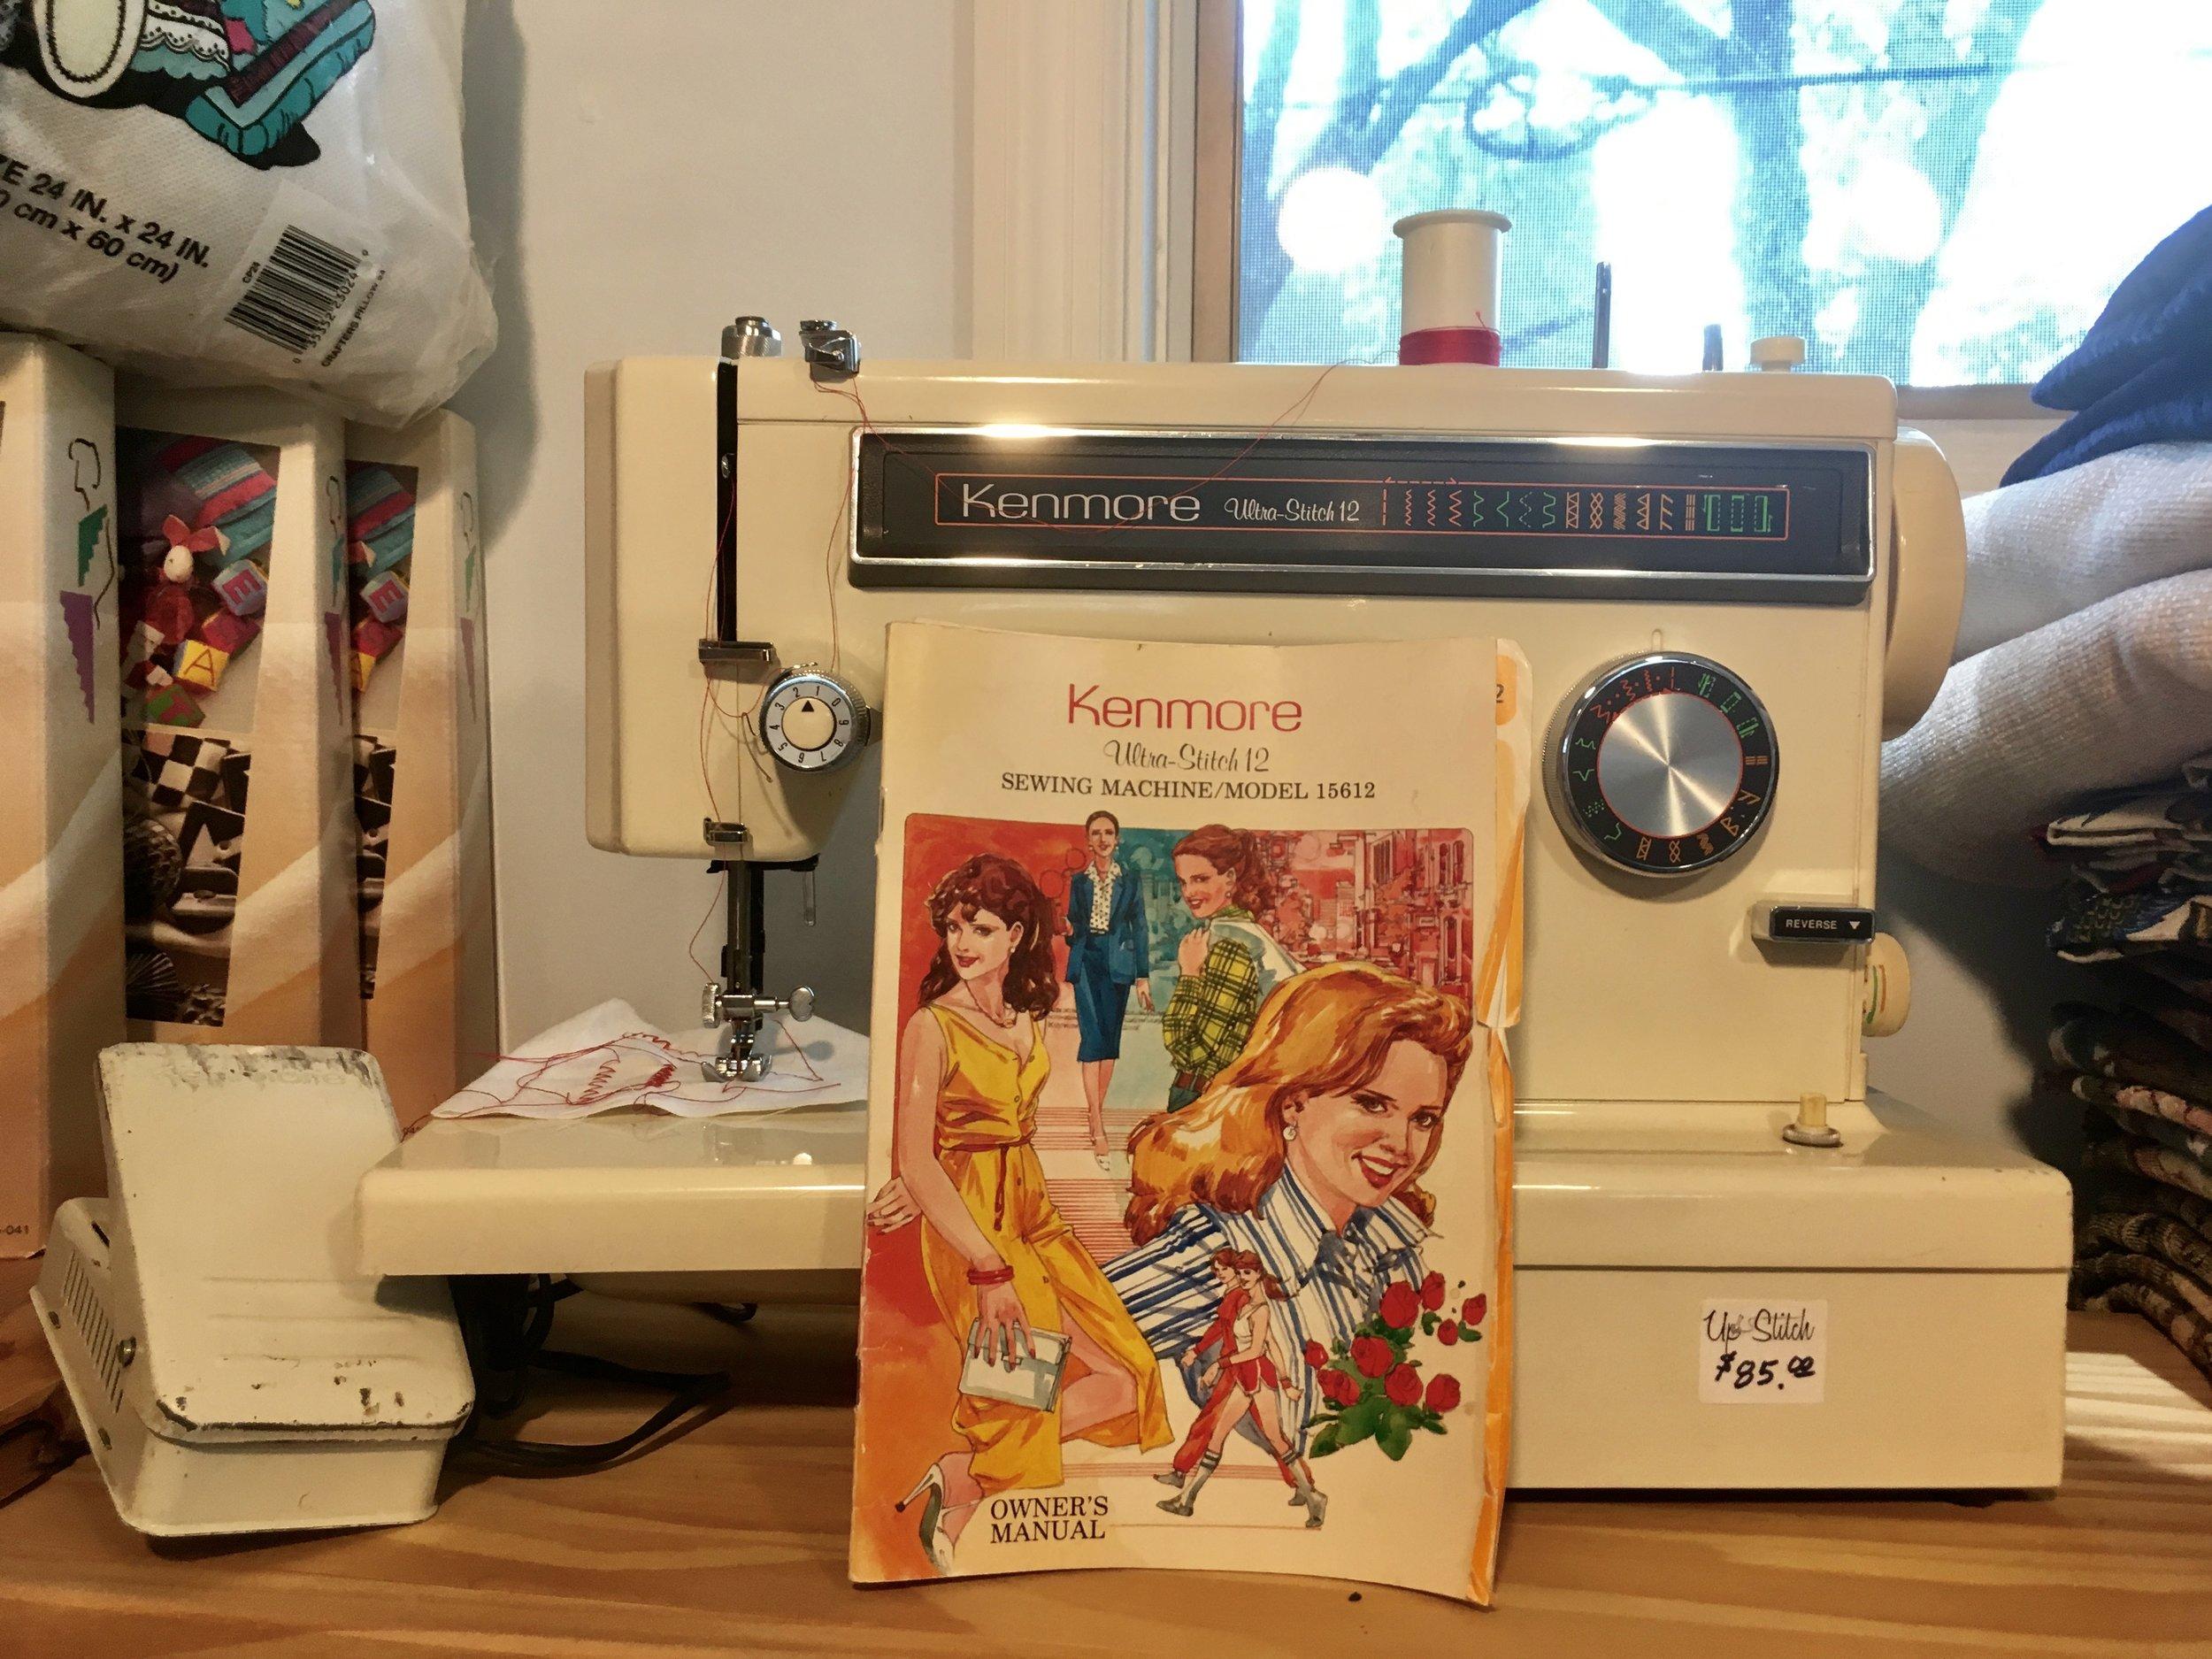 Kenmore Ultra-Stitch 12 Sewing Machine Model 15612, $85.